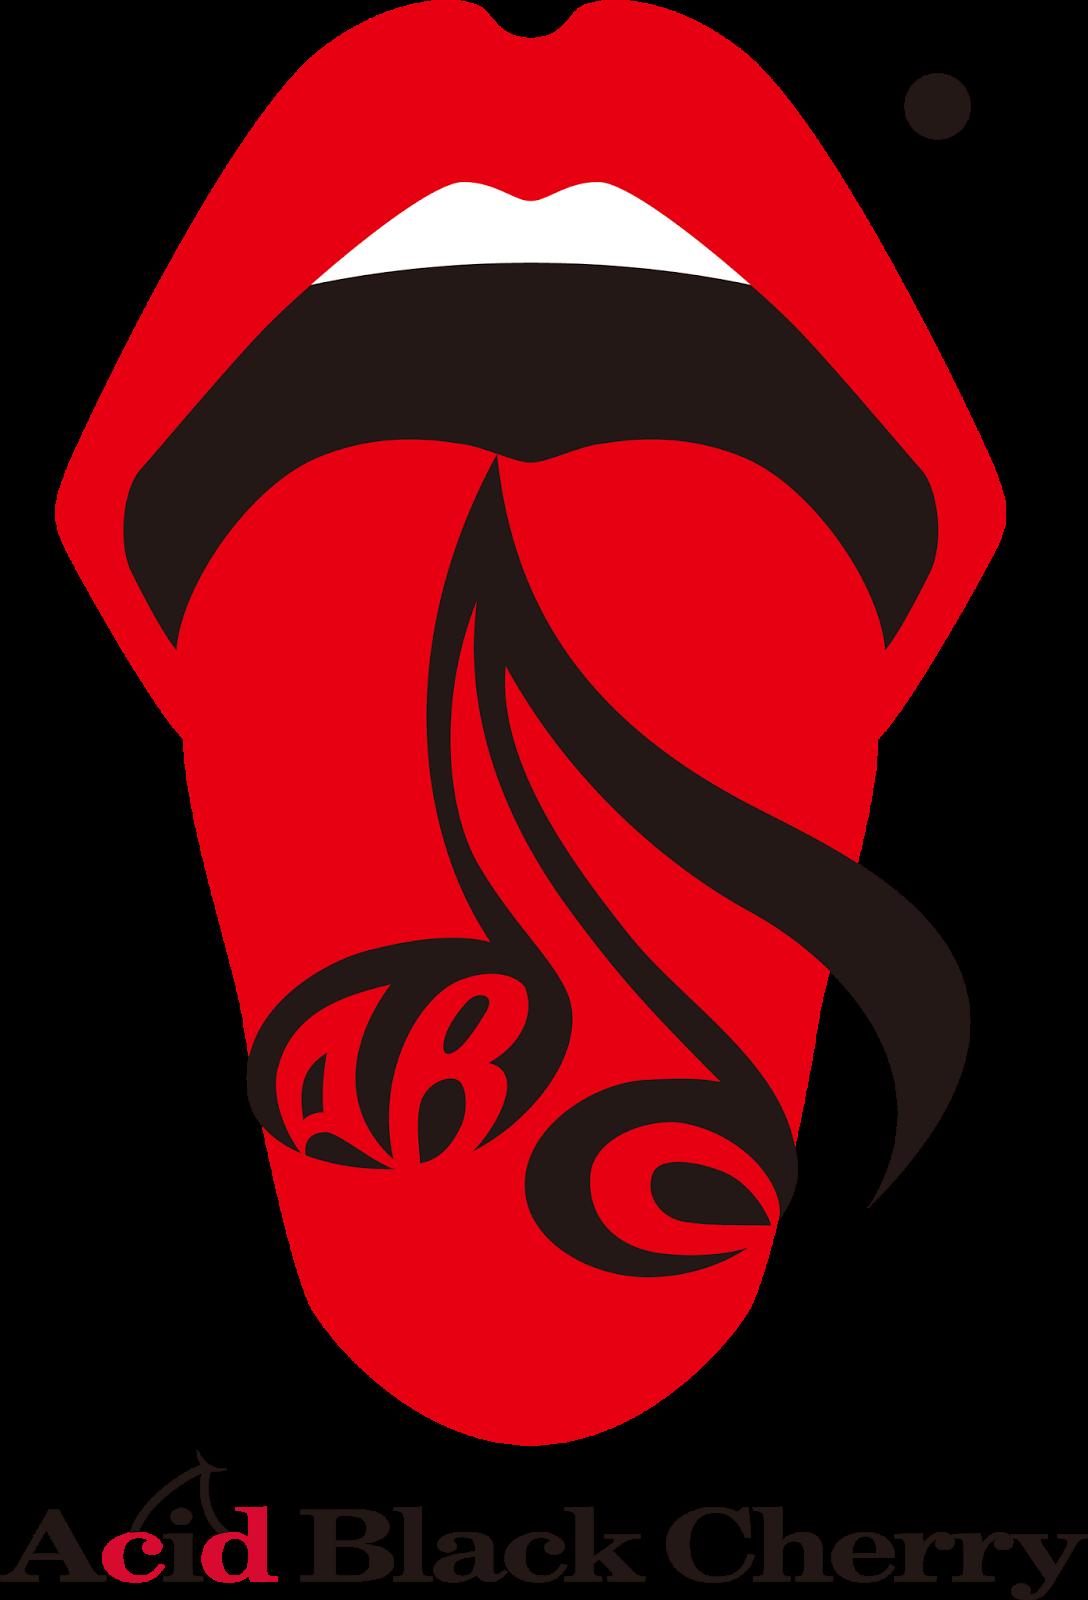 Logodol 全てが高画質 背景透過なアーティストのロゴをお届けする